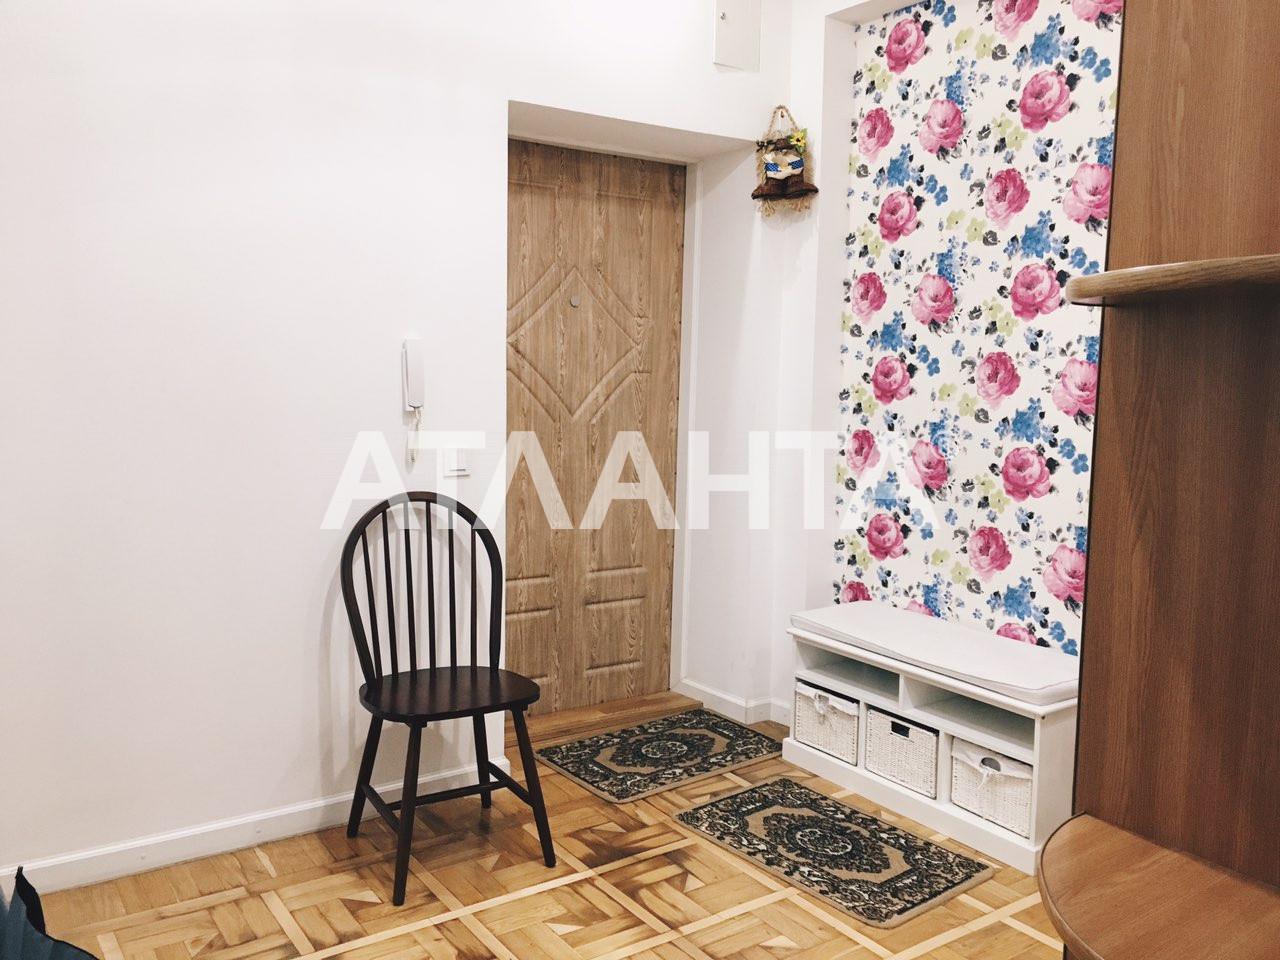 Продается 2-комнатная Квартира на ул. Семинарская (Гамарника) — 75 000 у.е. (фото №6)